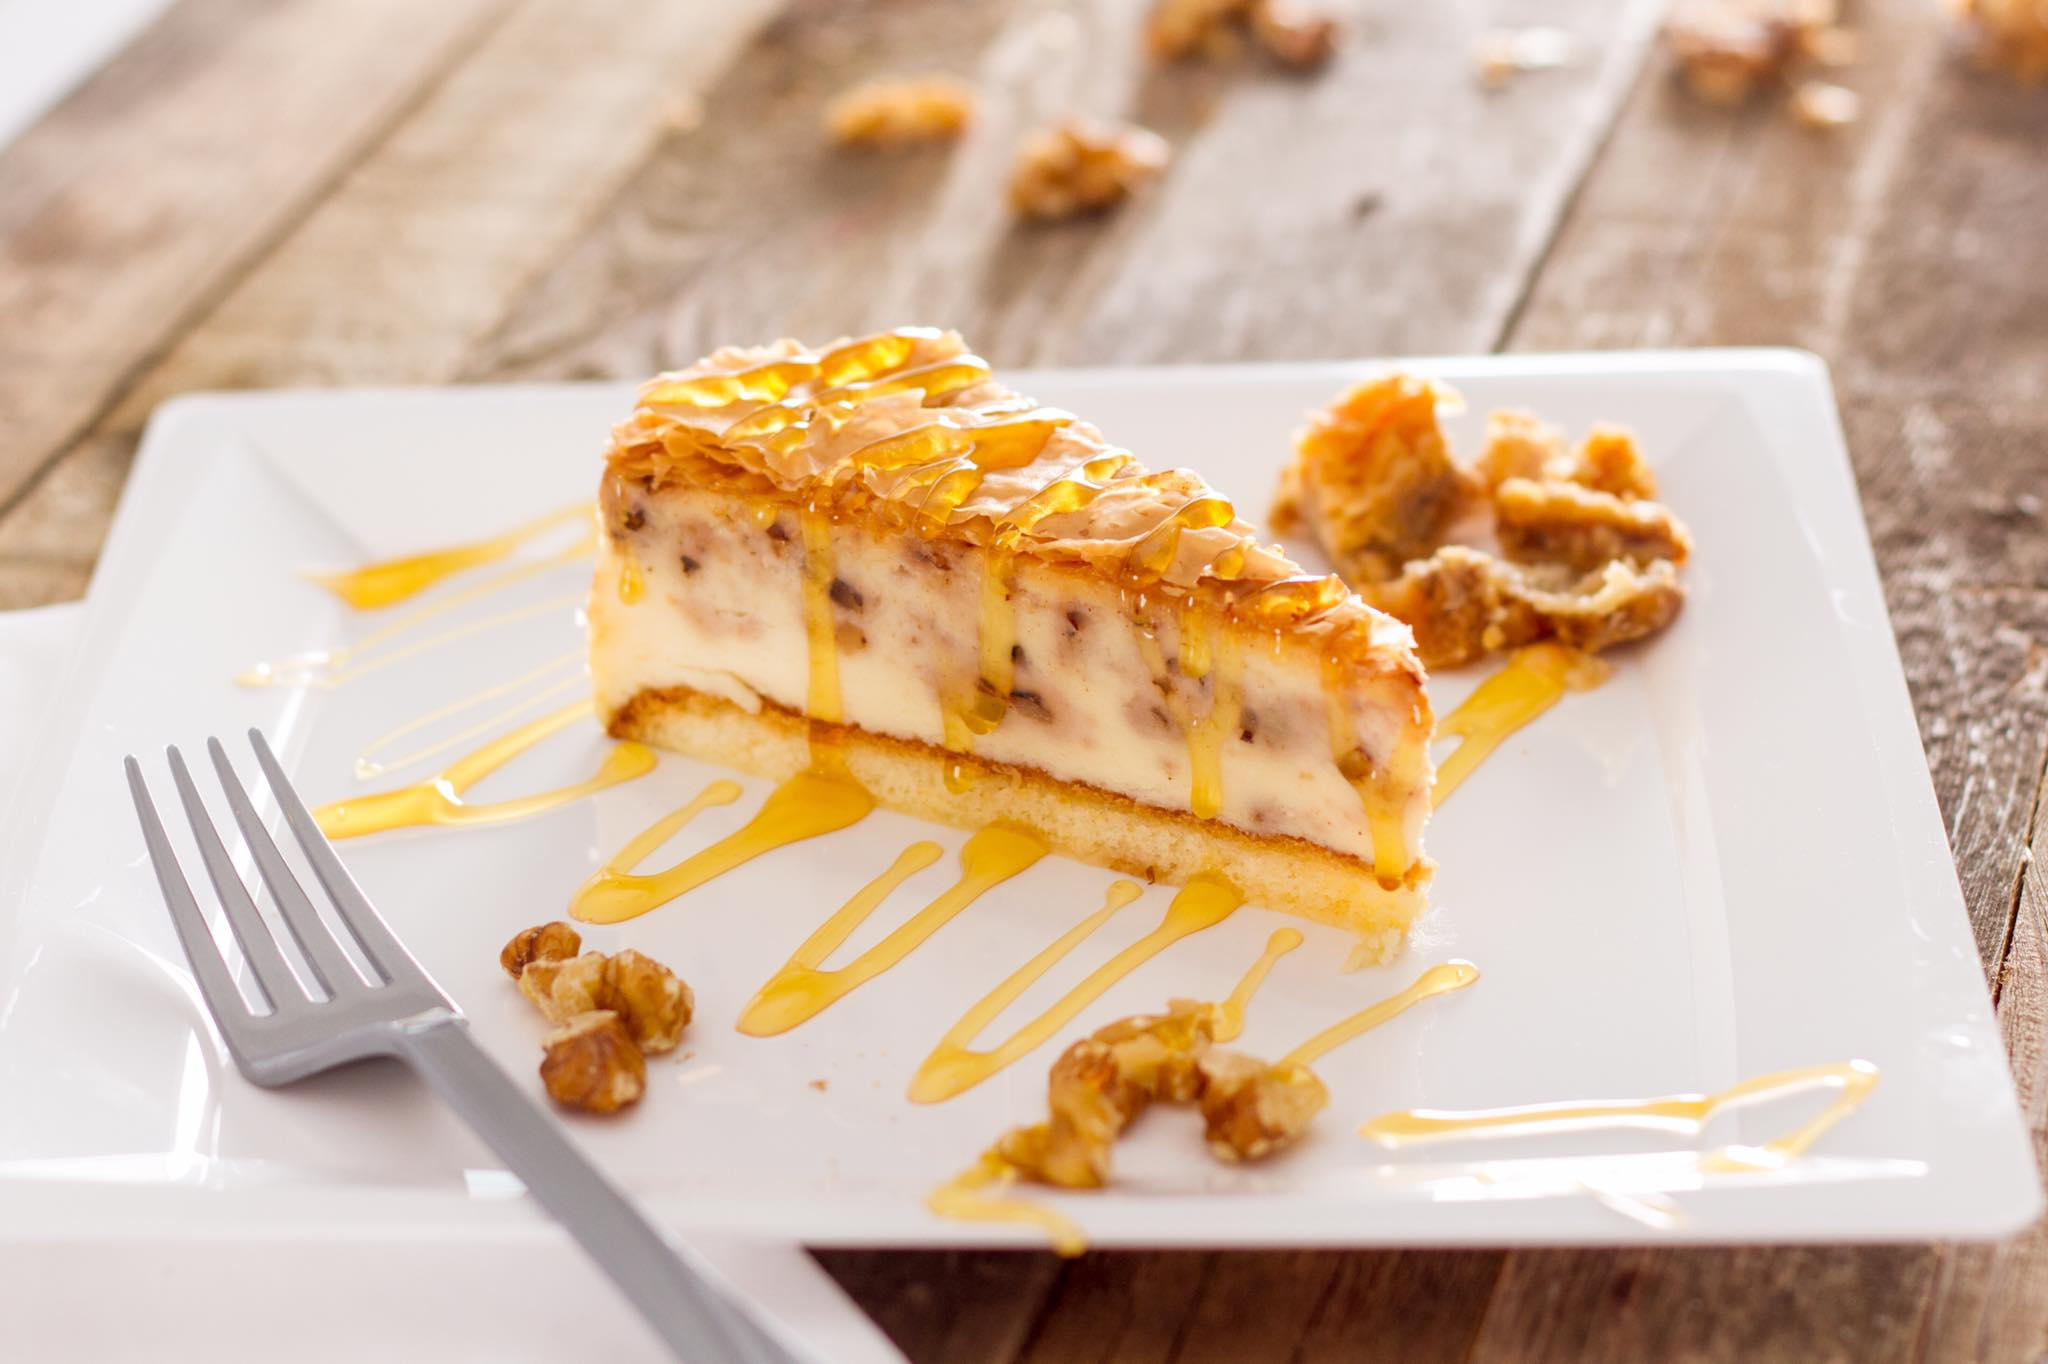 Baklava cheesecake at The Simple Greek